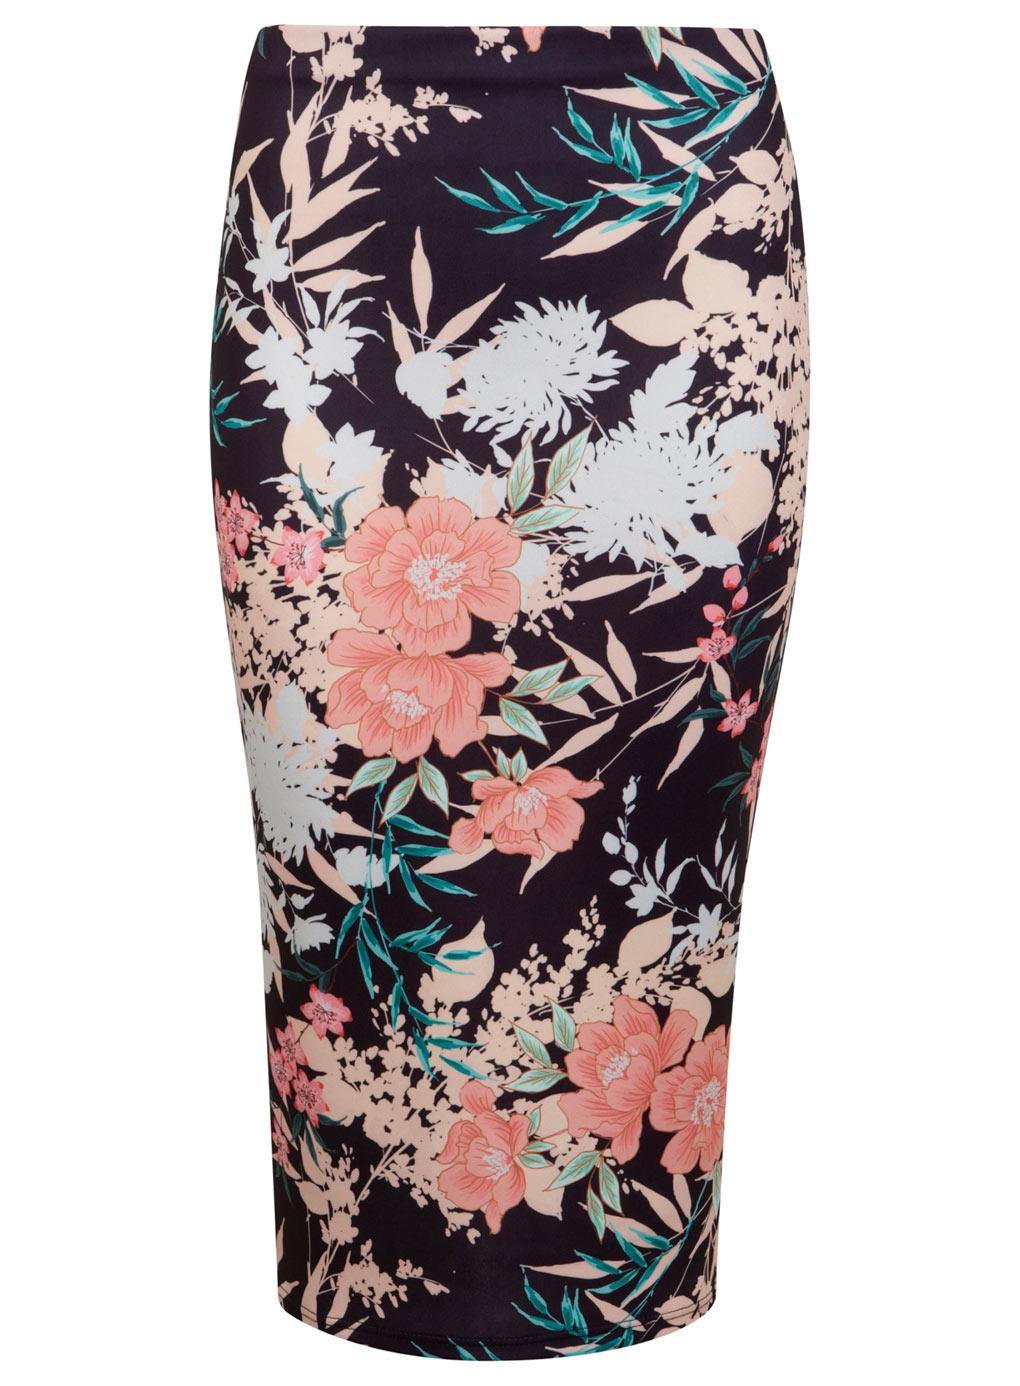 1dbc3fef72c90 M1ss S3lfridge NAVY Oriental Floral Midi Skirt - Size 6 to 16. SKU 19807